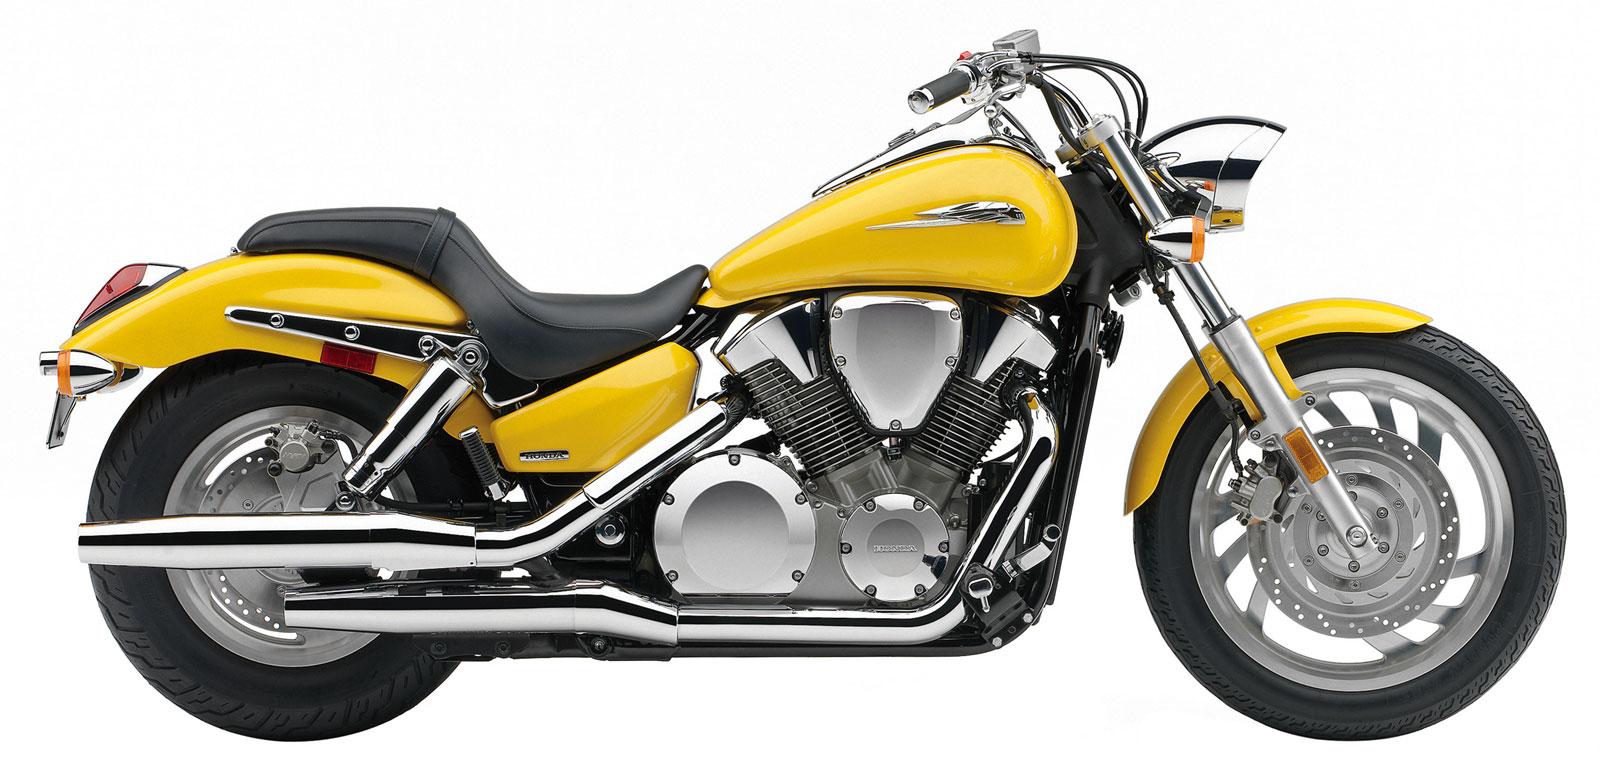 2008-Honda-VTX1300Ca.jpg